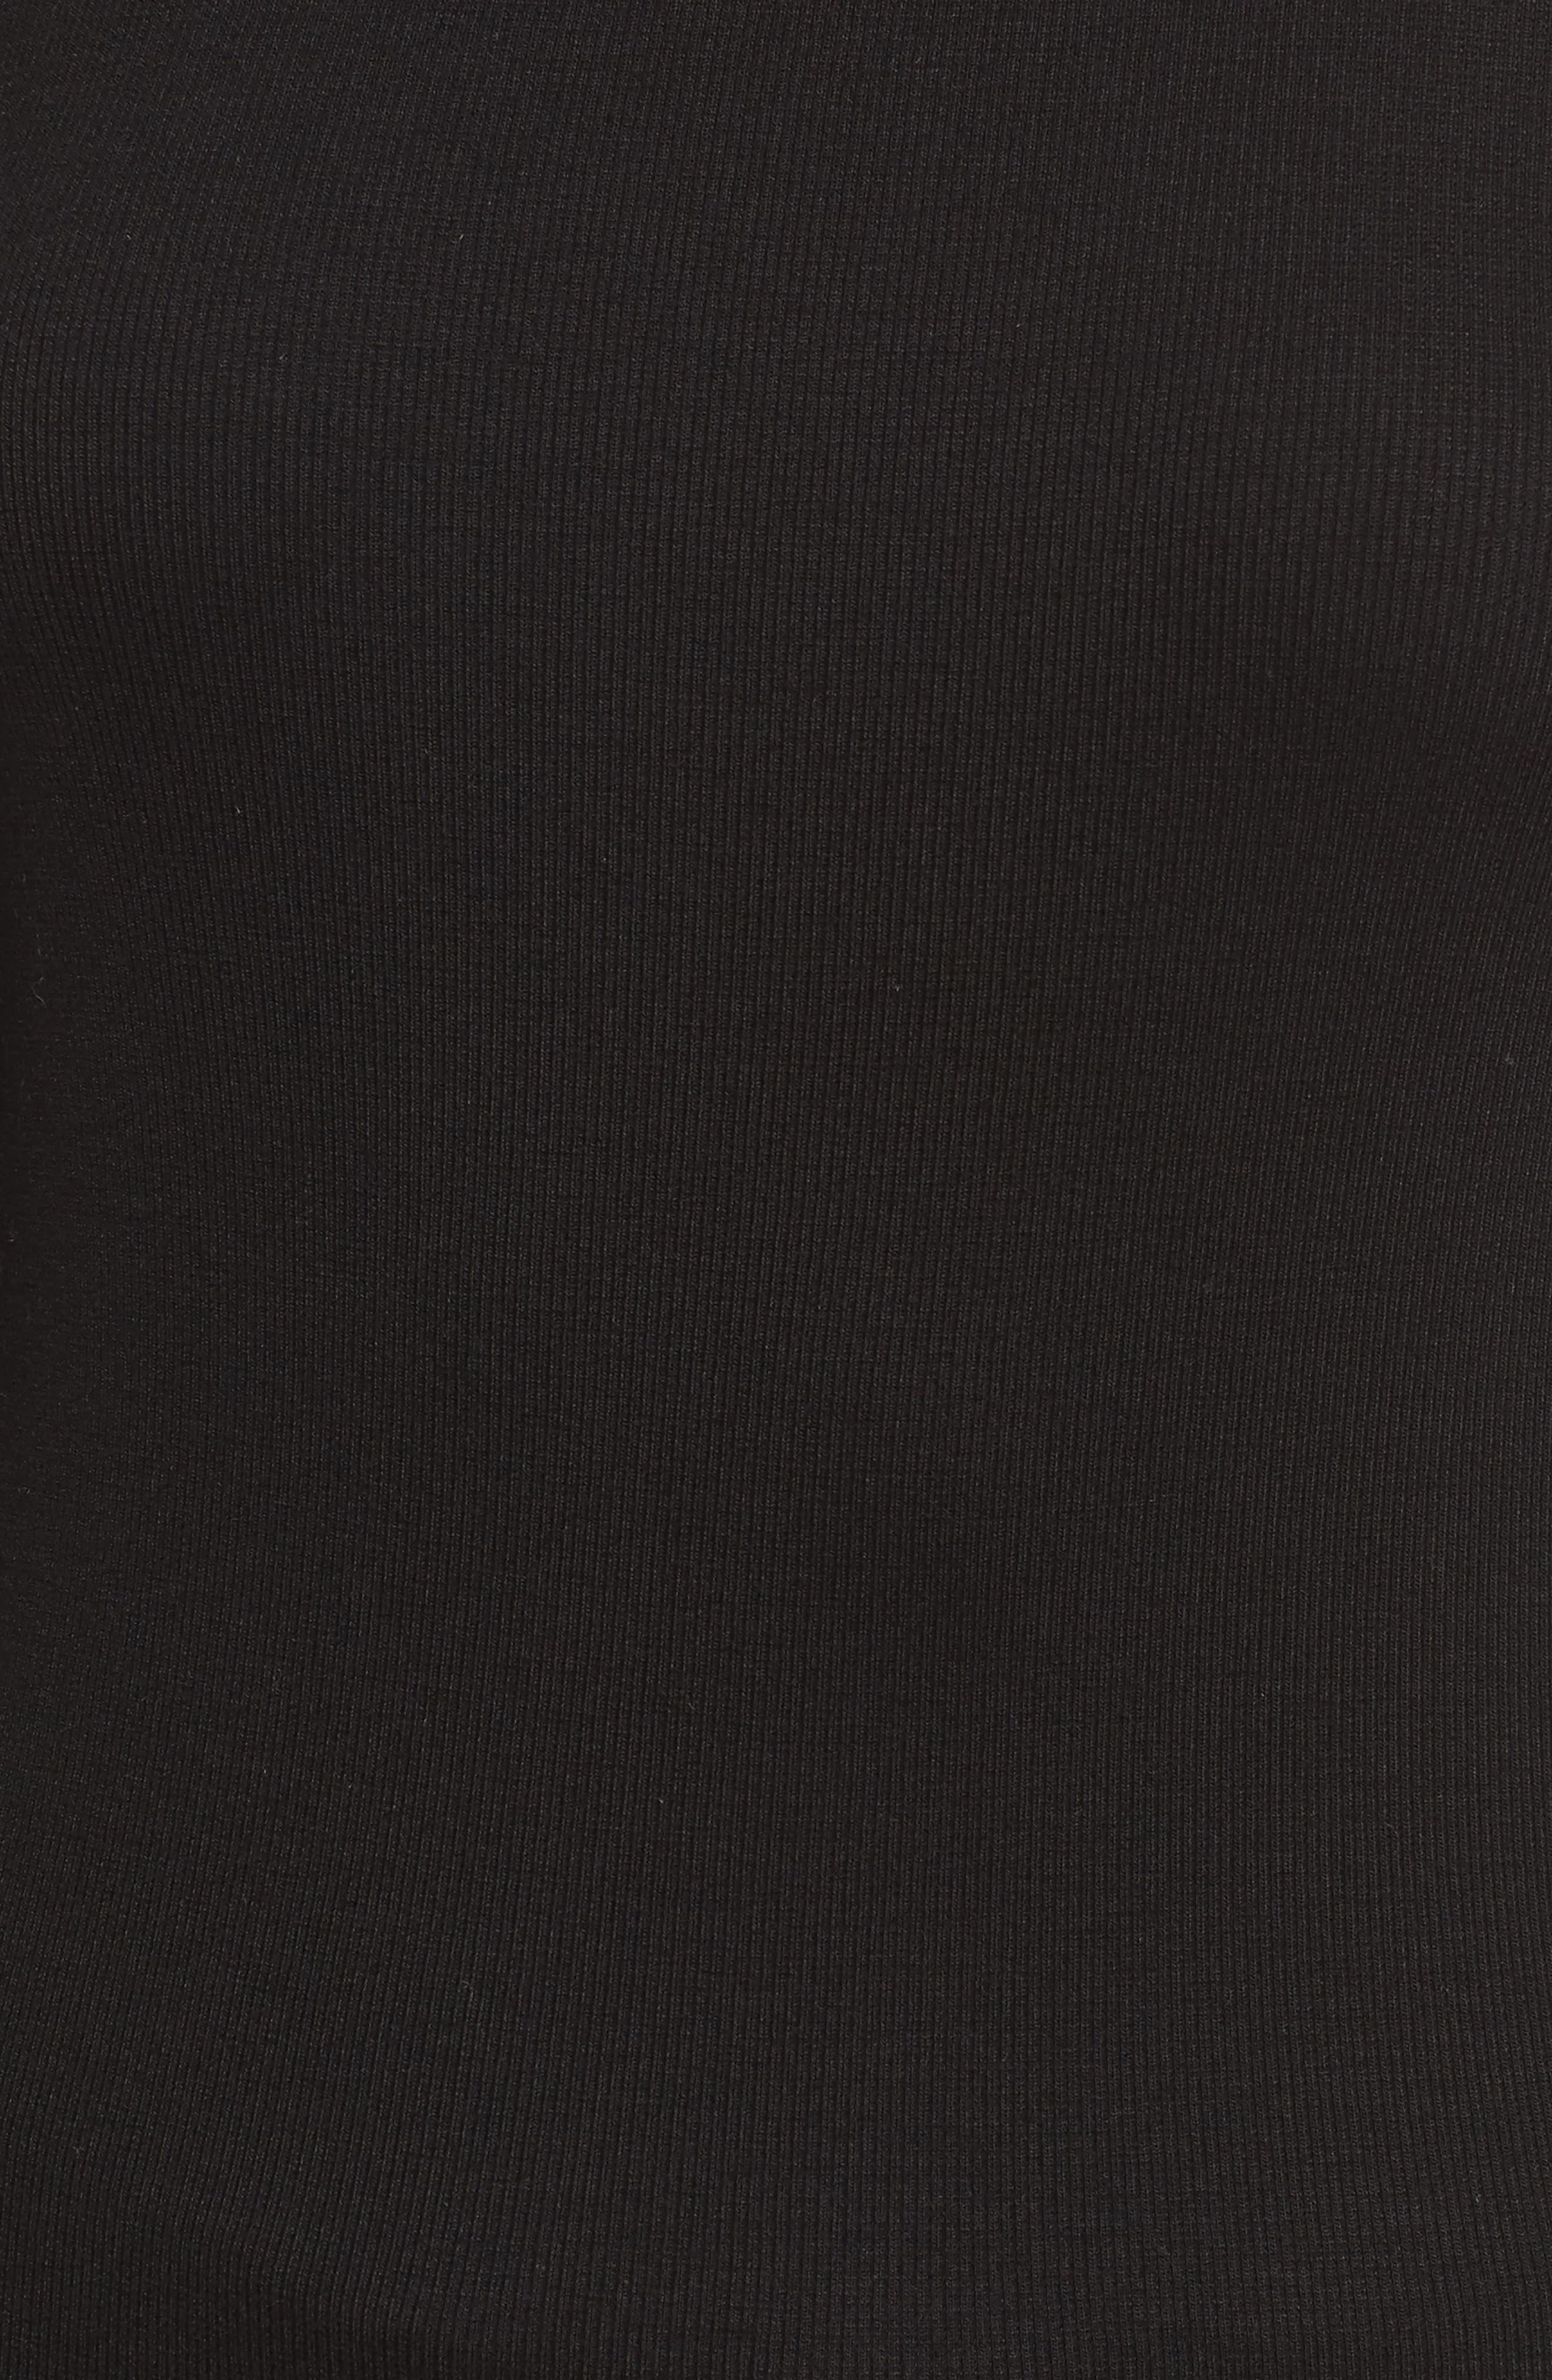 Ribbed Stretch Turtleneck,                             Alternate thumbnail 5, color,                             Black